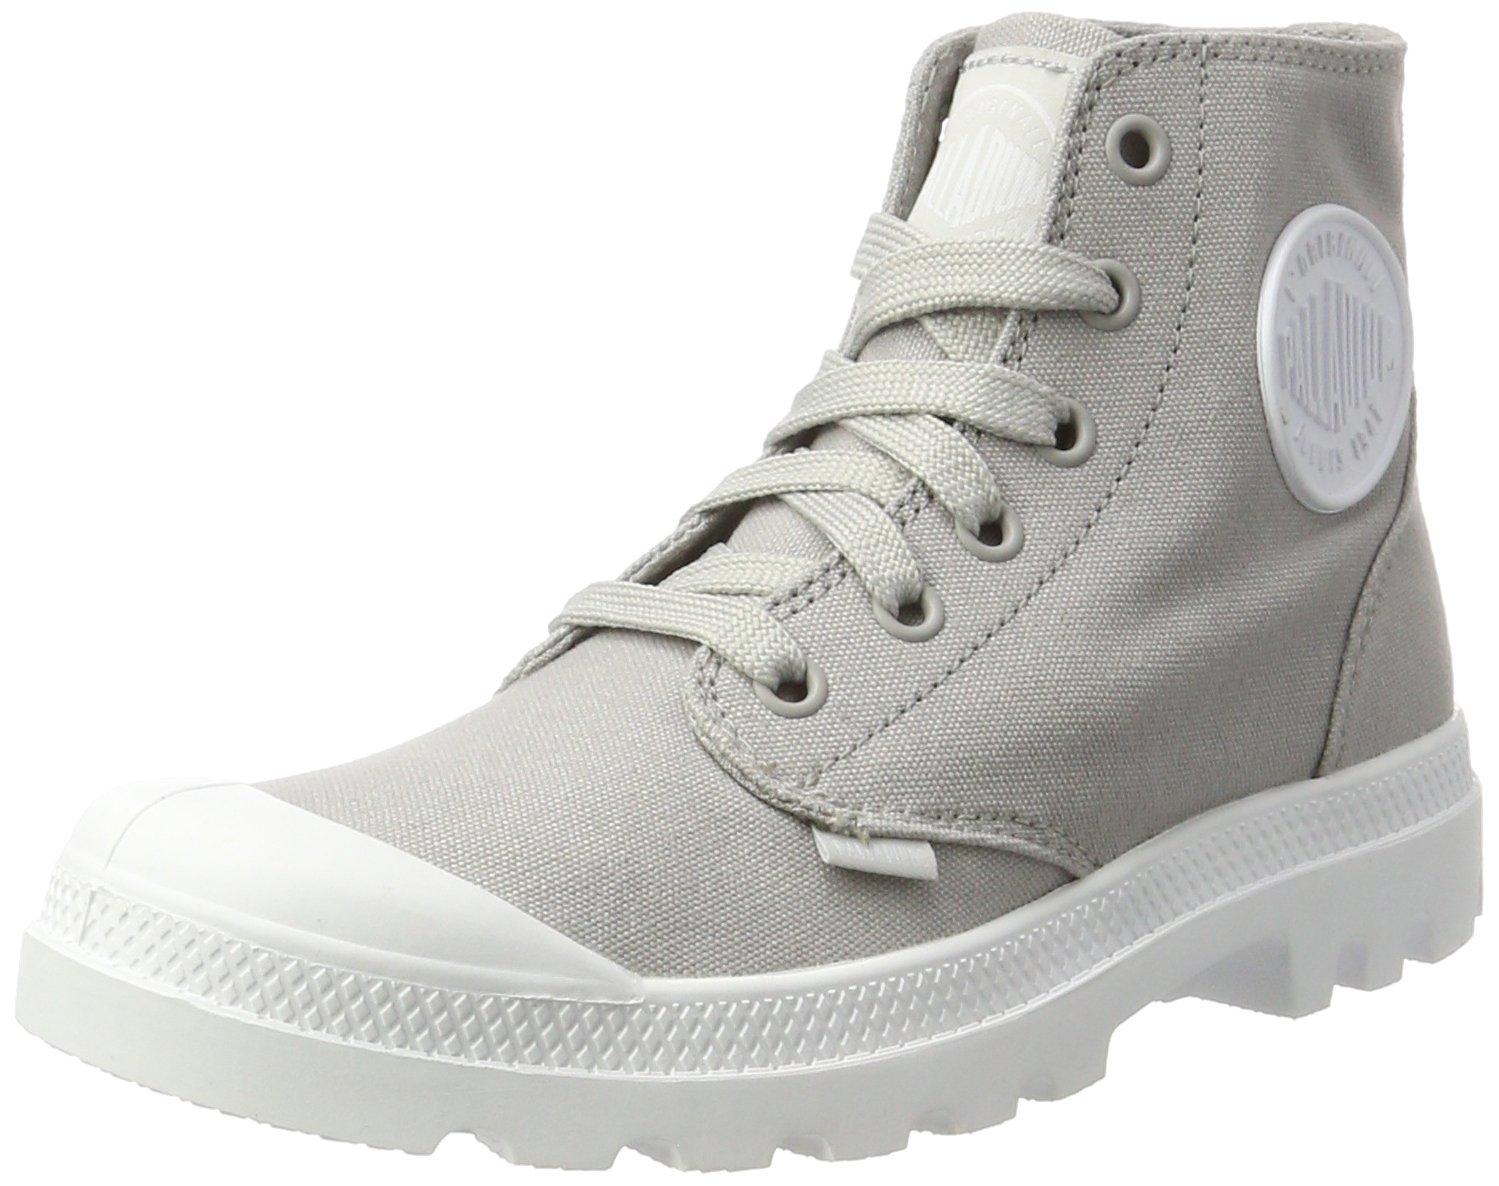 Palladium Men's Blanc Hi Boots, Grey, 8 US